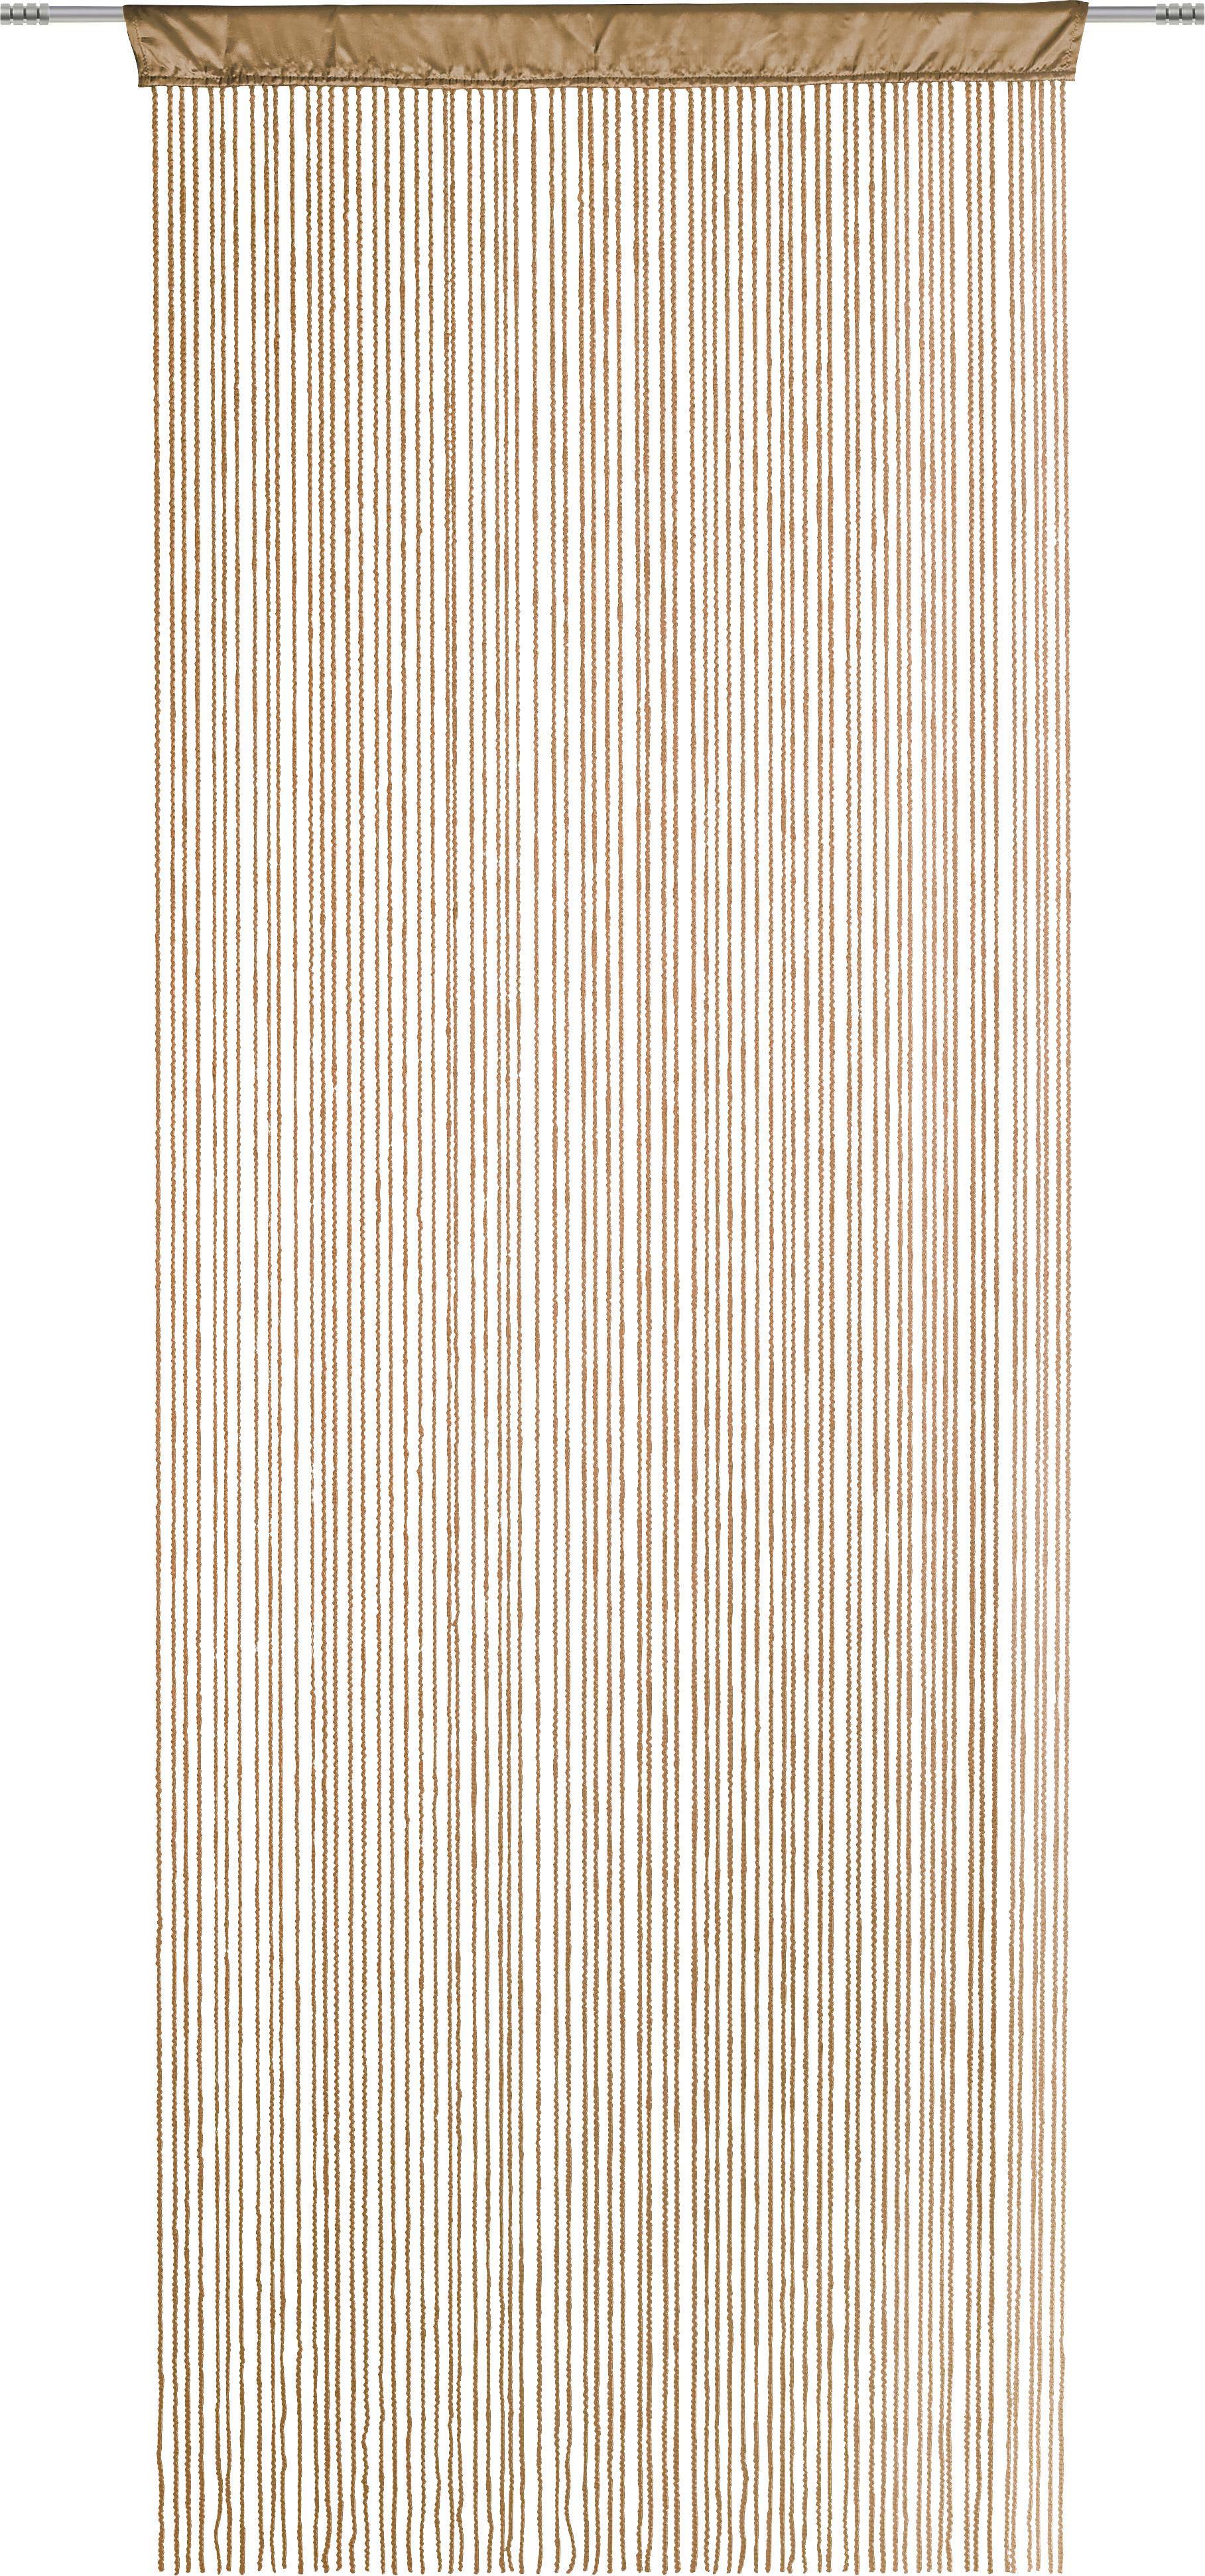 ŠPAGETI ZAVJESA - smeđa, Moderno, tekstil (90/245cm) - ESPOSA